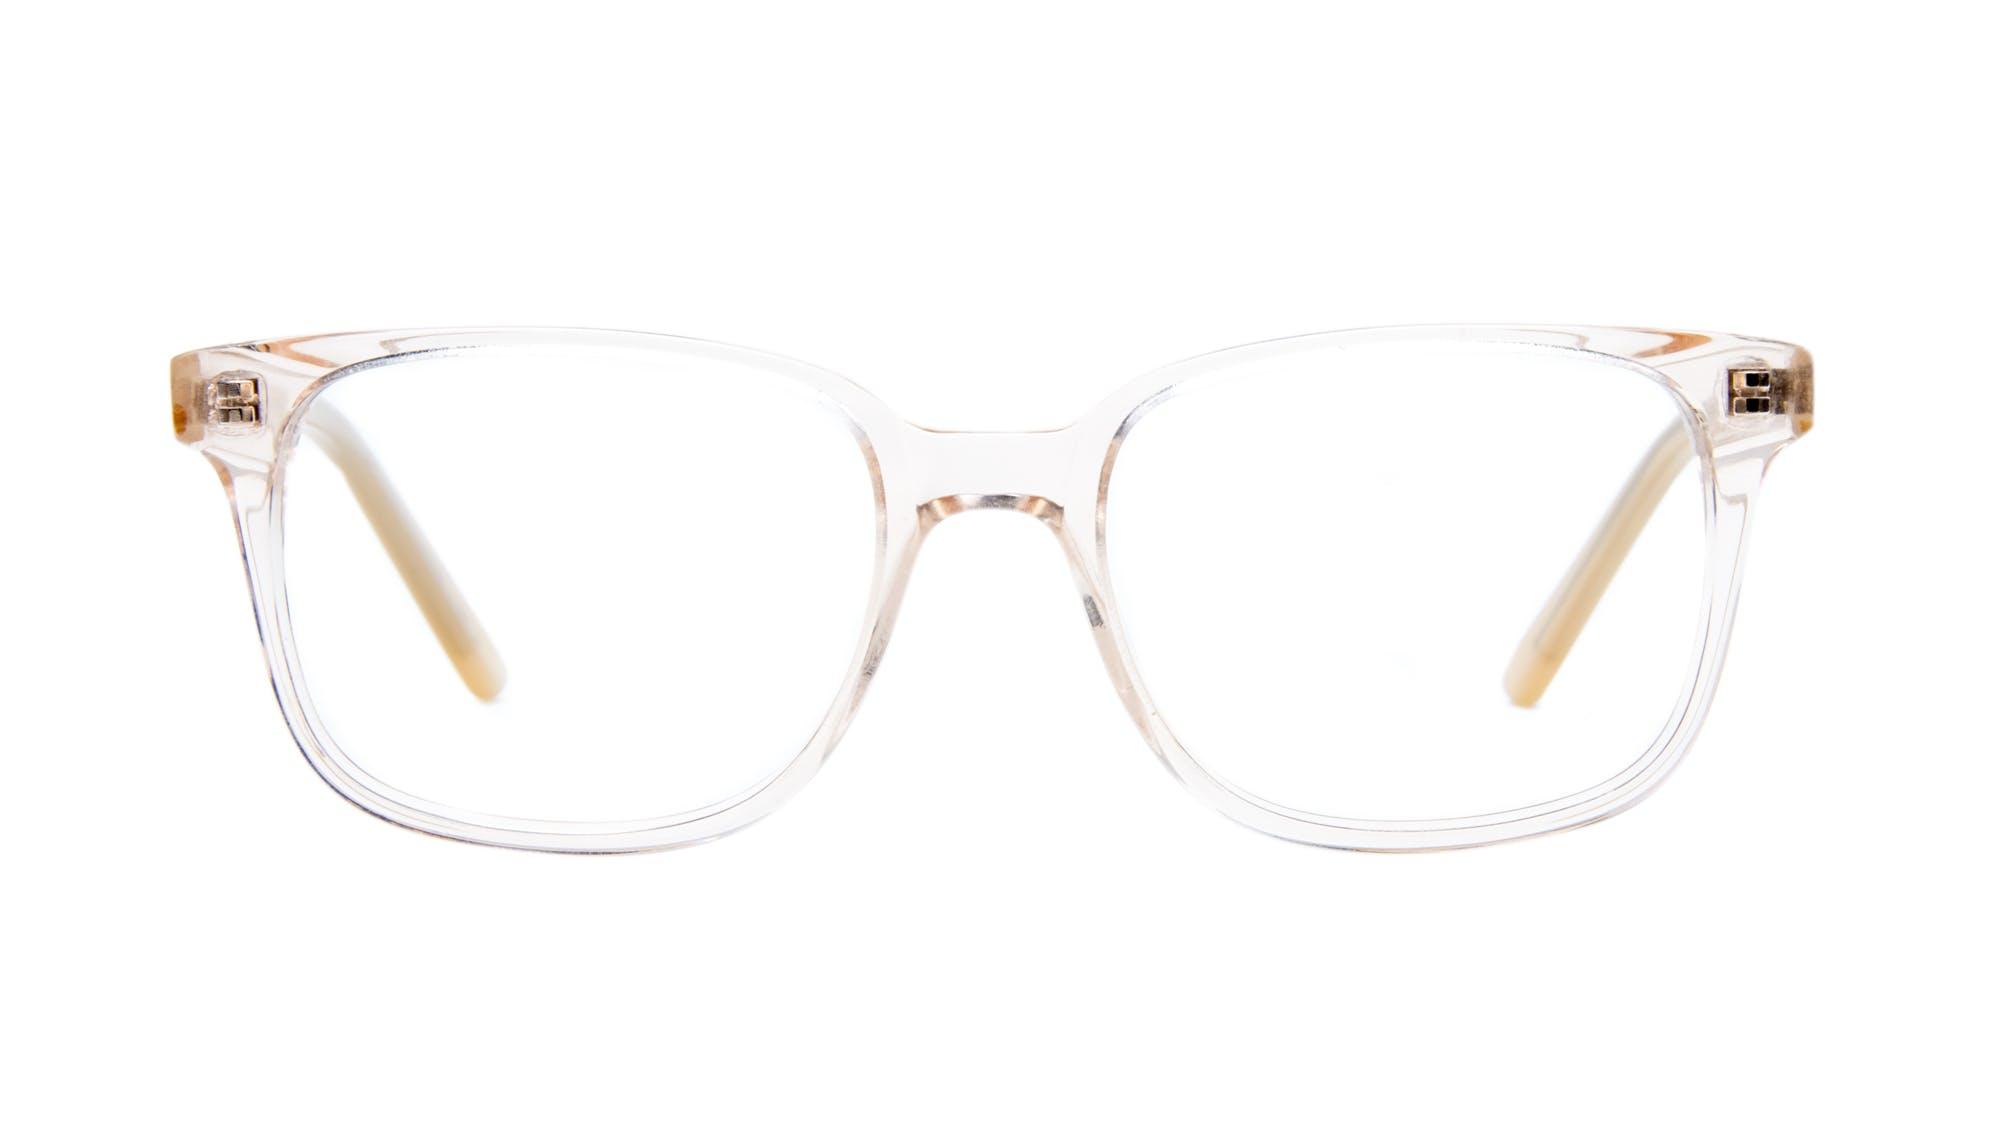 Affordable Fashion Glasses Rectangle Square Eyeglasses Women Windsor Blond Metal